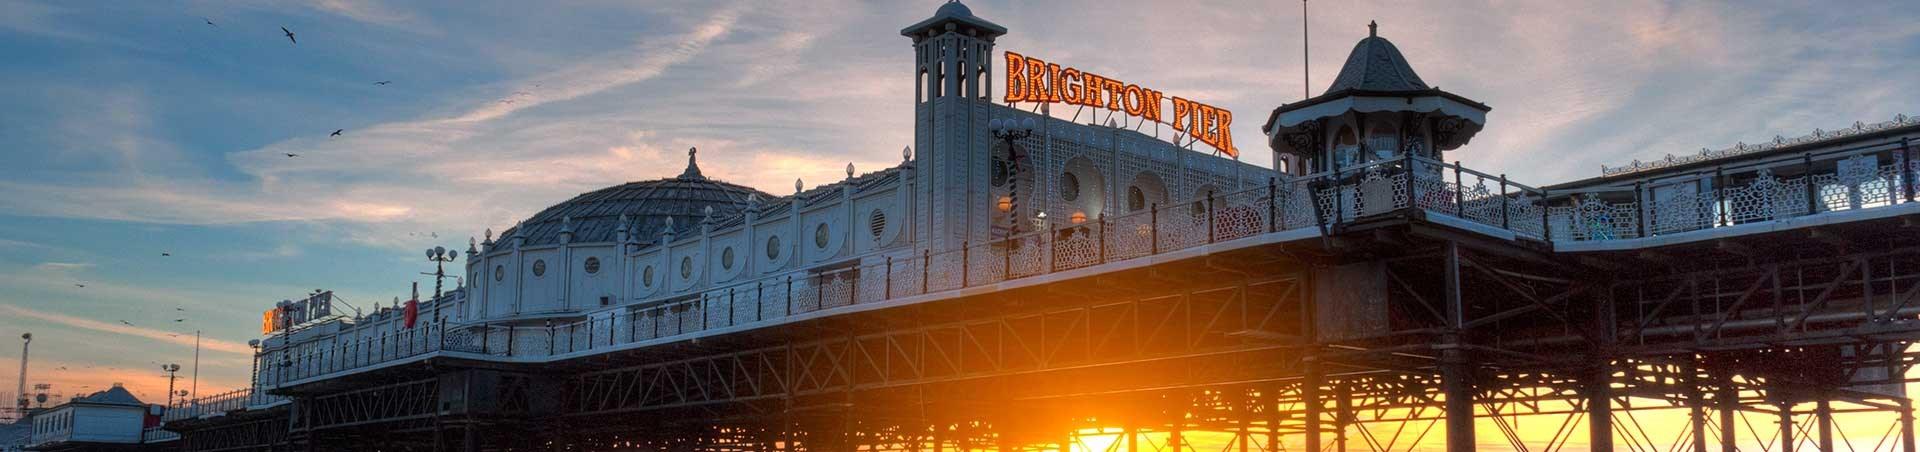 Cheap Coach Travel To Brighton National Express